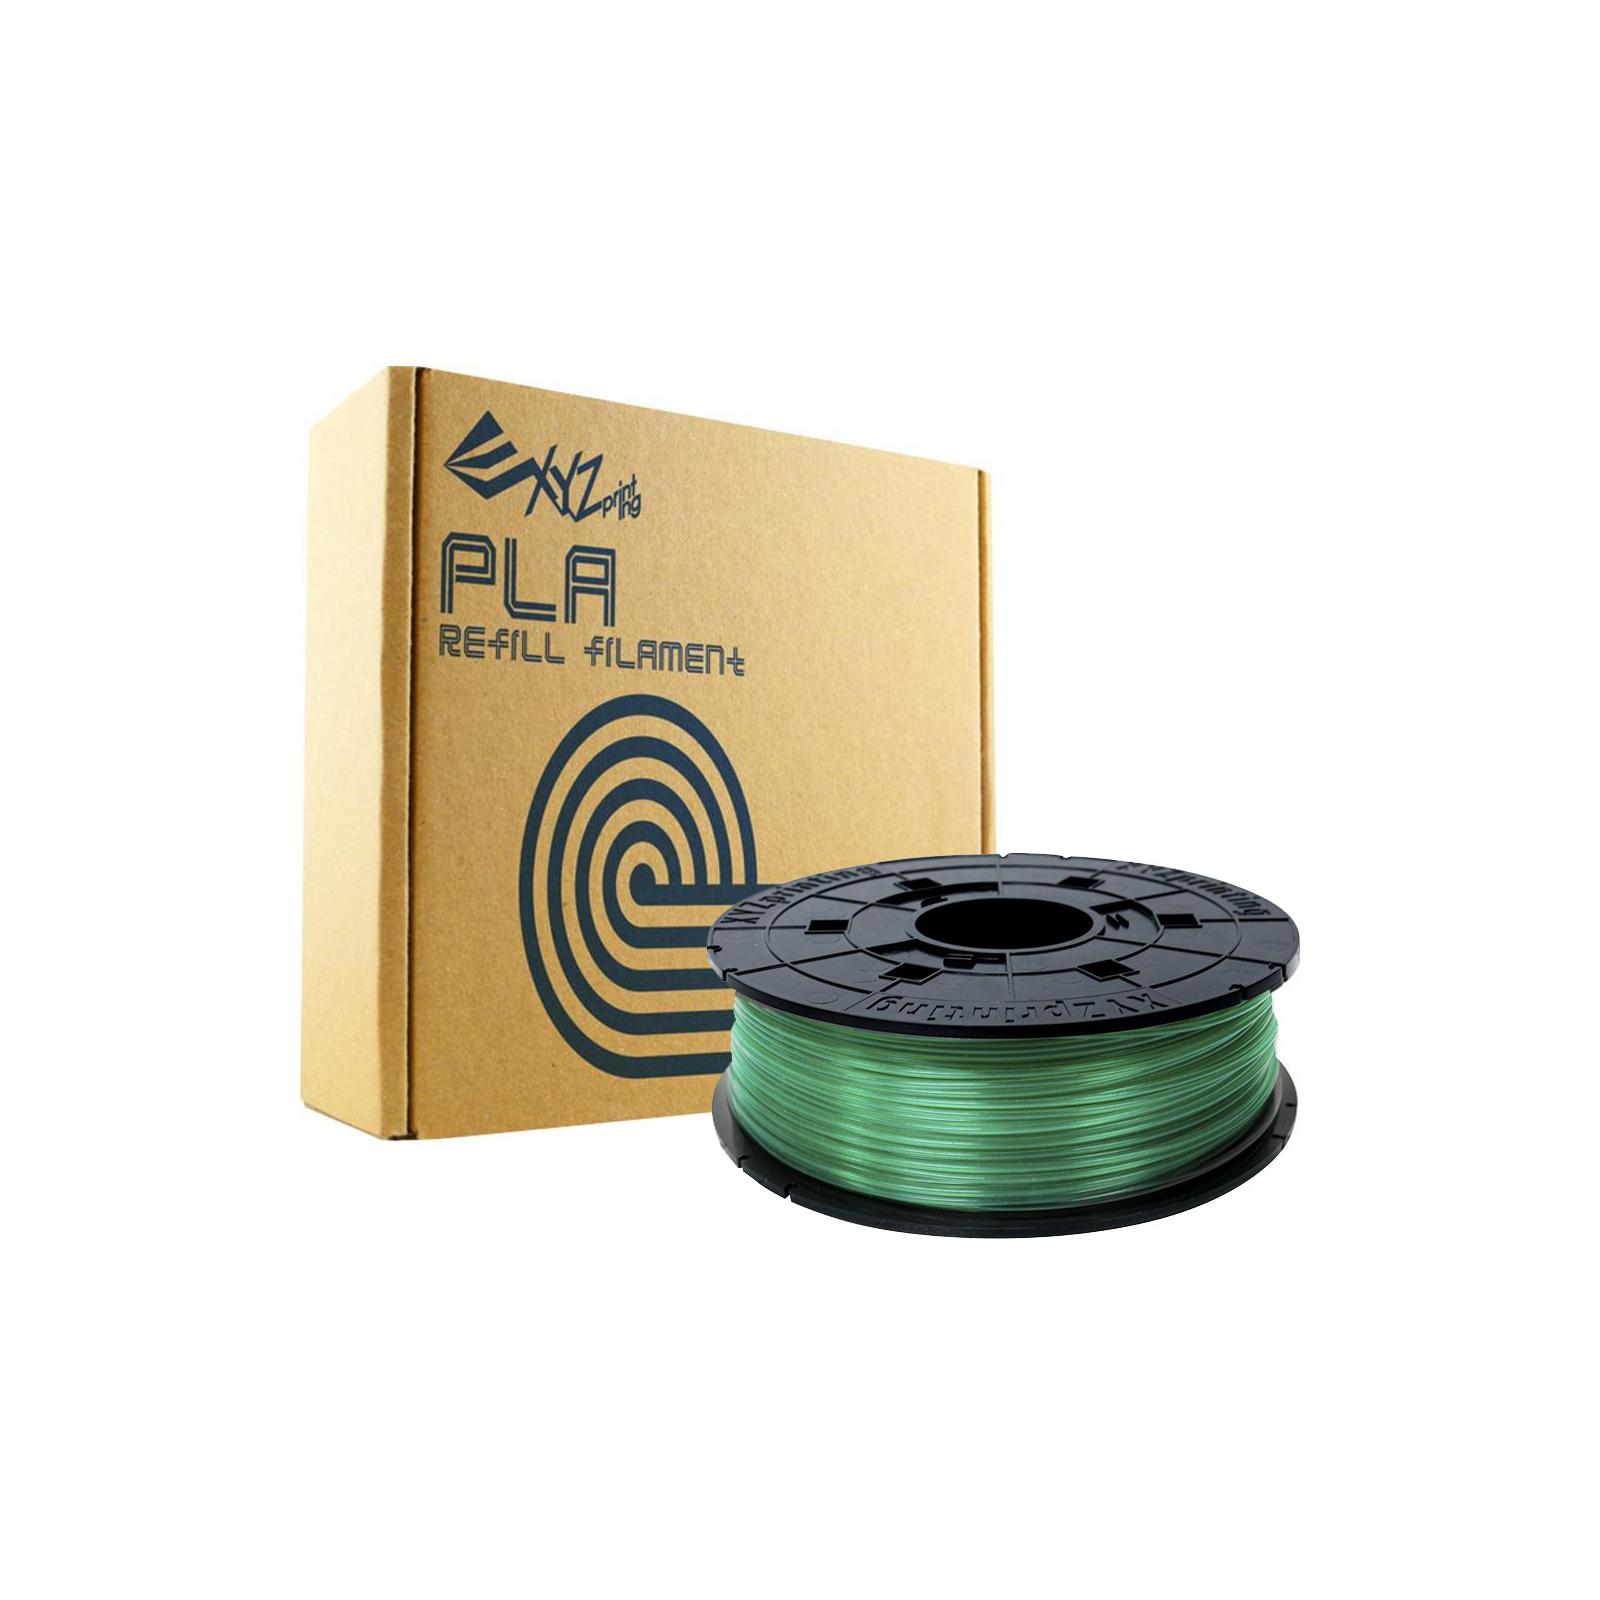 Пластик для 3D-принтера XYZprinting PLA 1.75мм/0.6кг Filament, Clear Green (RFPLBXEU04A) зображення 2